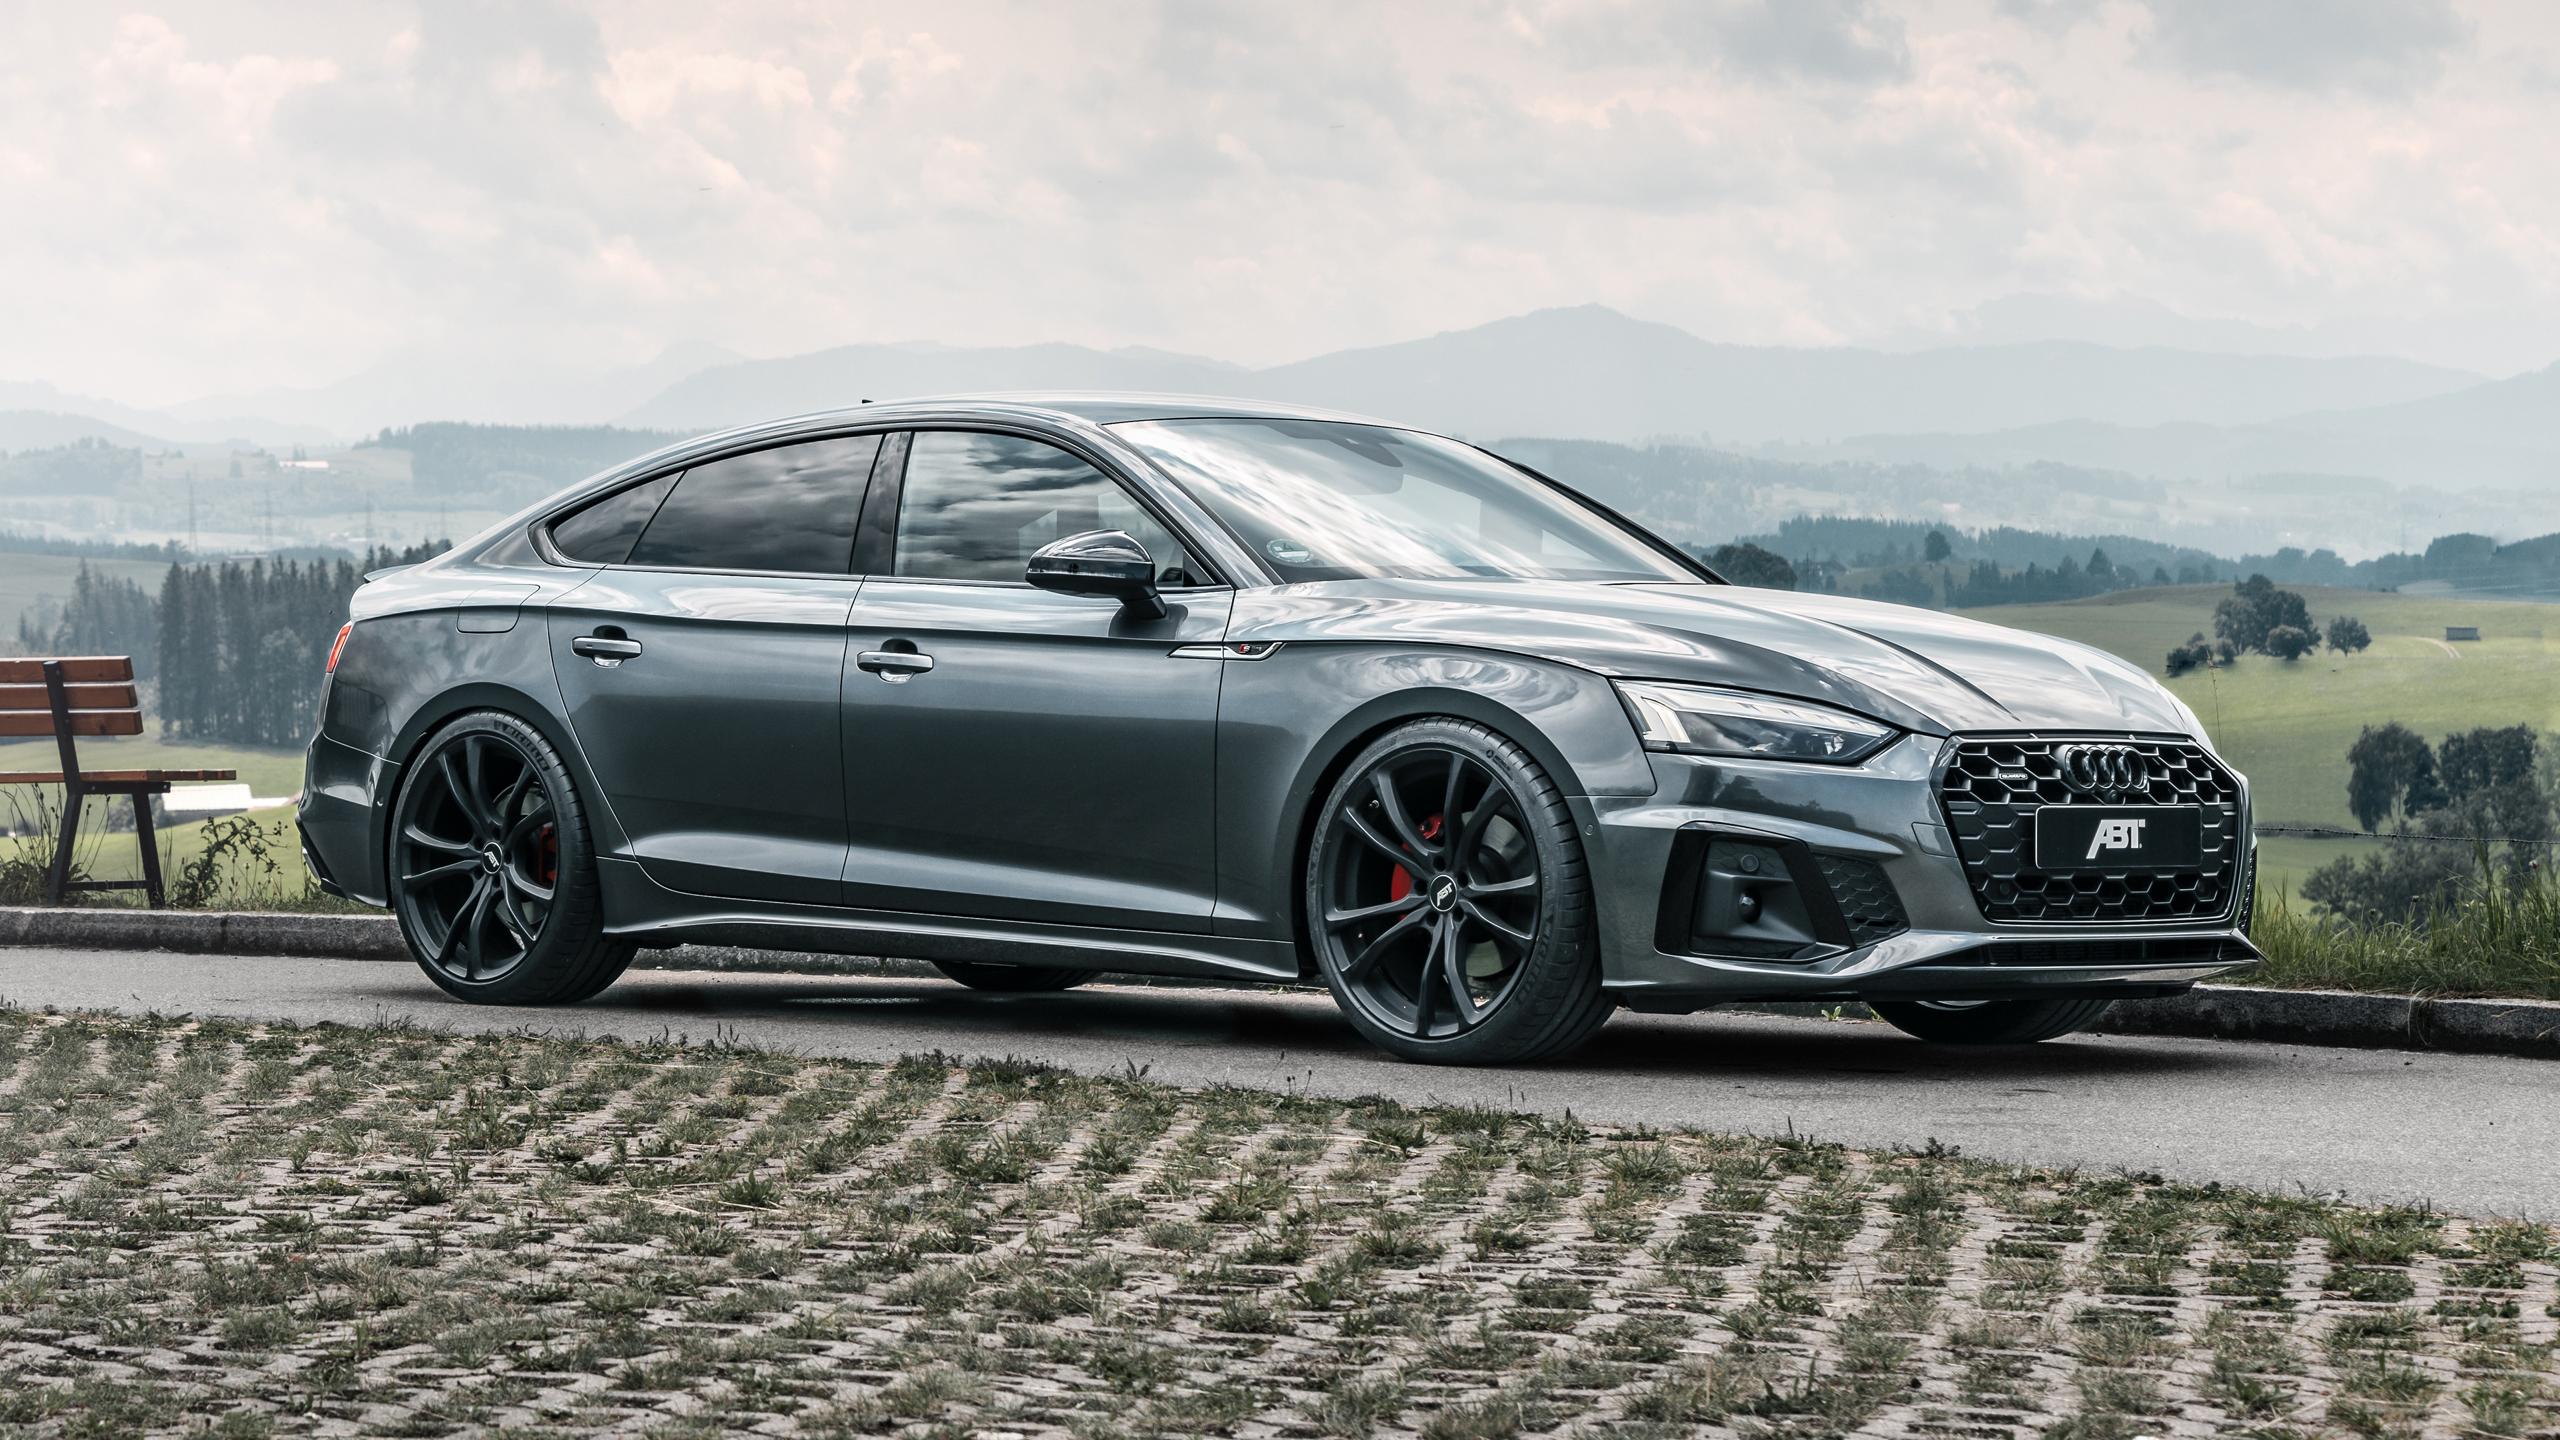 Kekurangan Audi A5 Quattro Spesifikasi